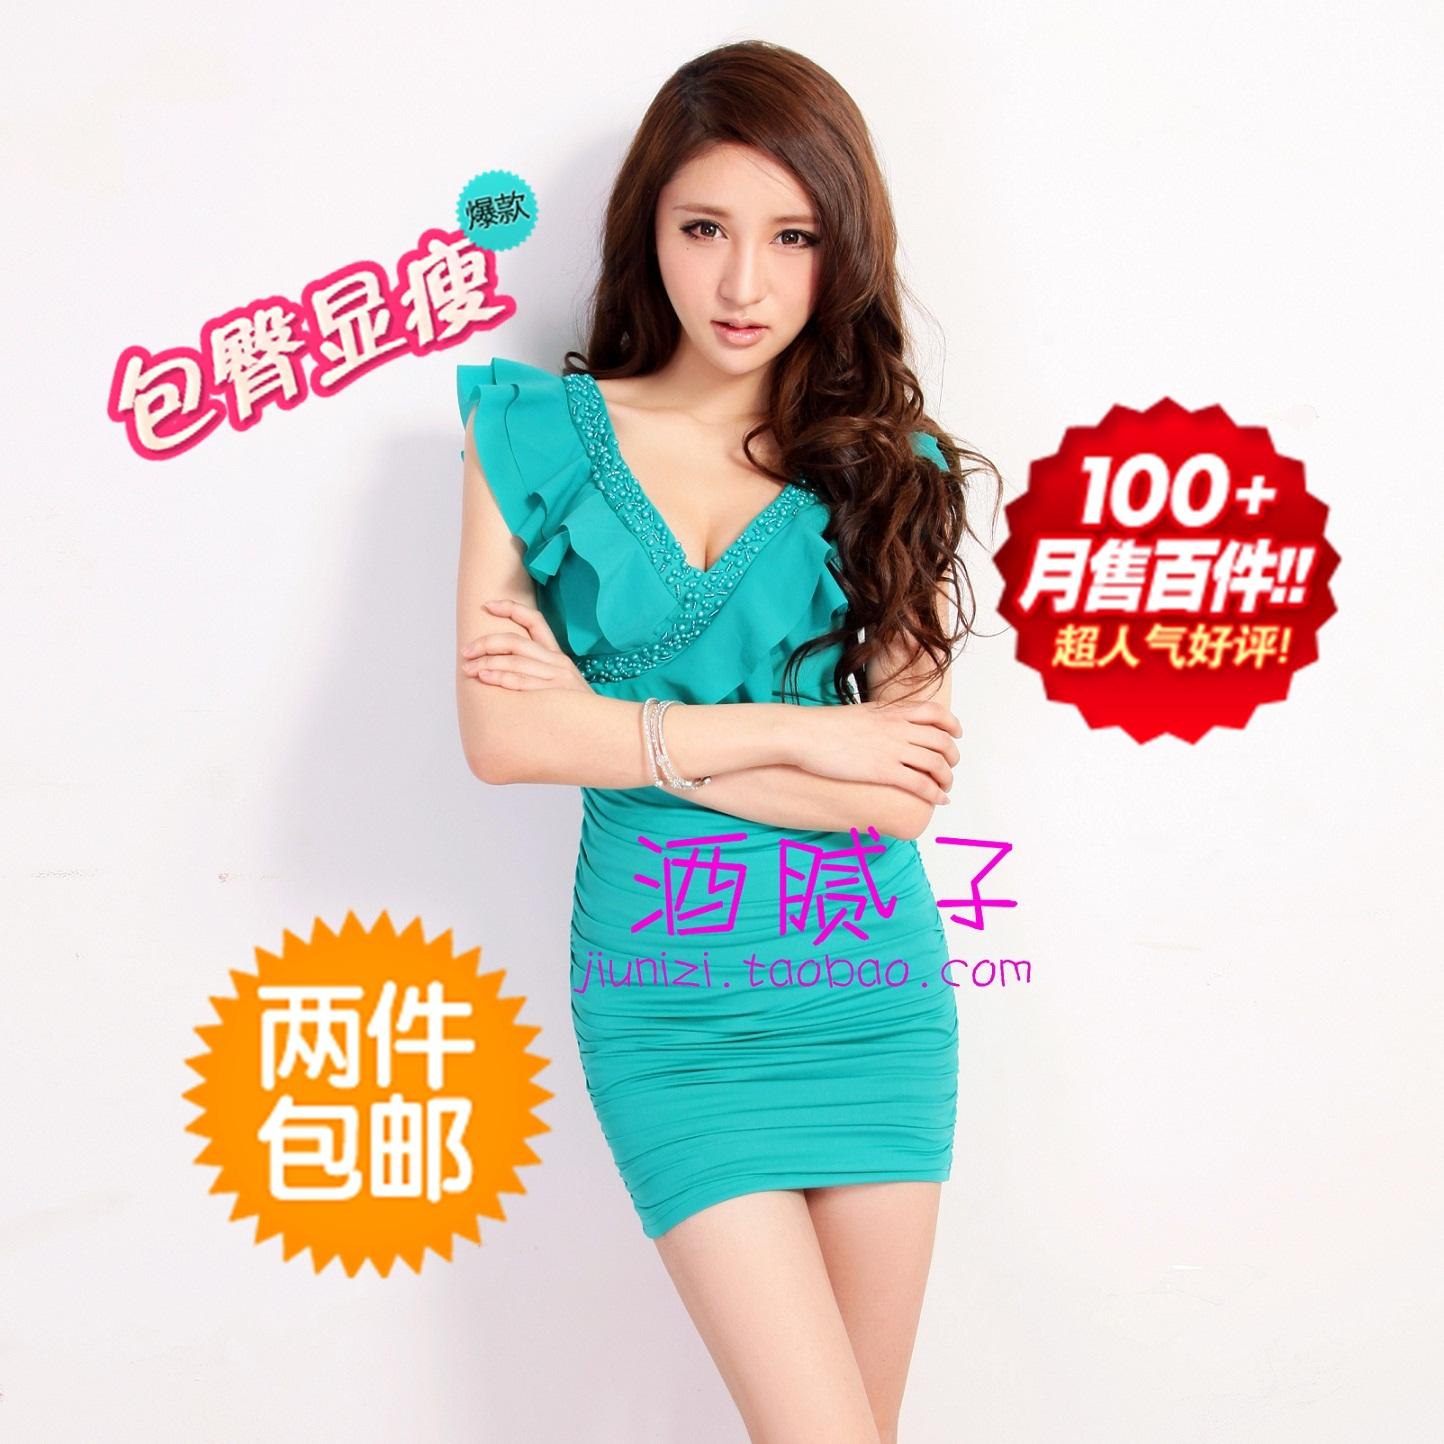 http://img01.taobaocdn.com/bao/uploaded/i1/T1ZSu_XlhlXXbOUXHX_113811.jpg